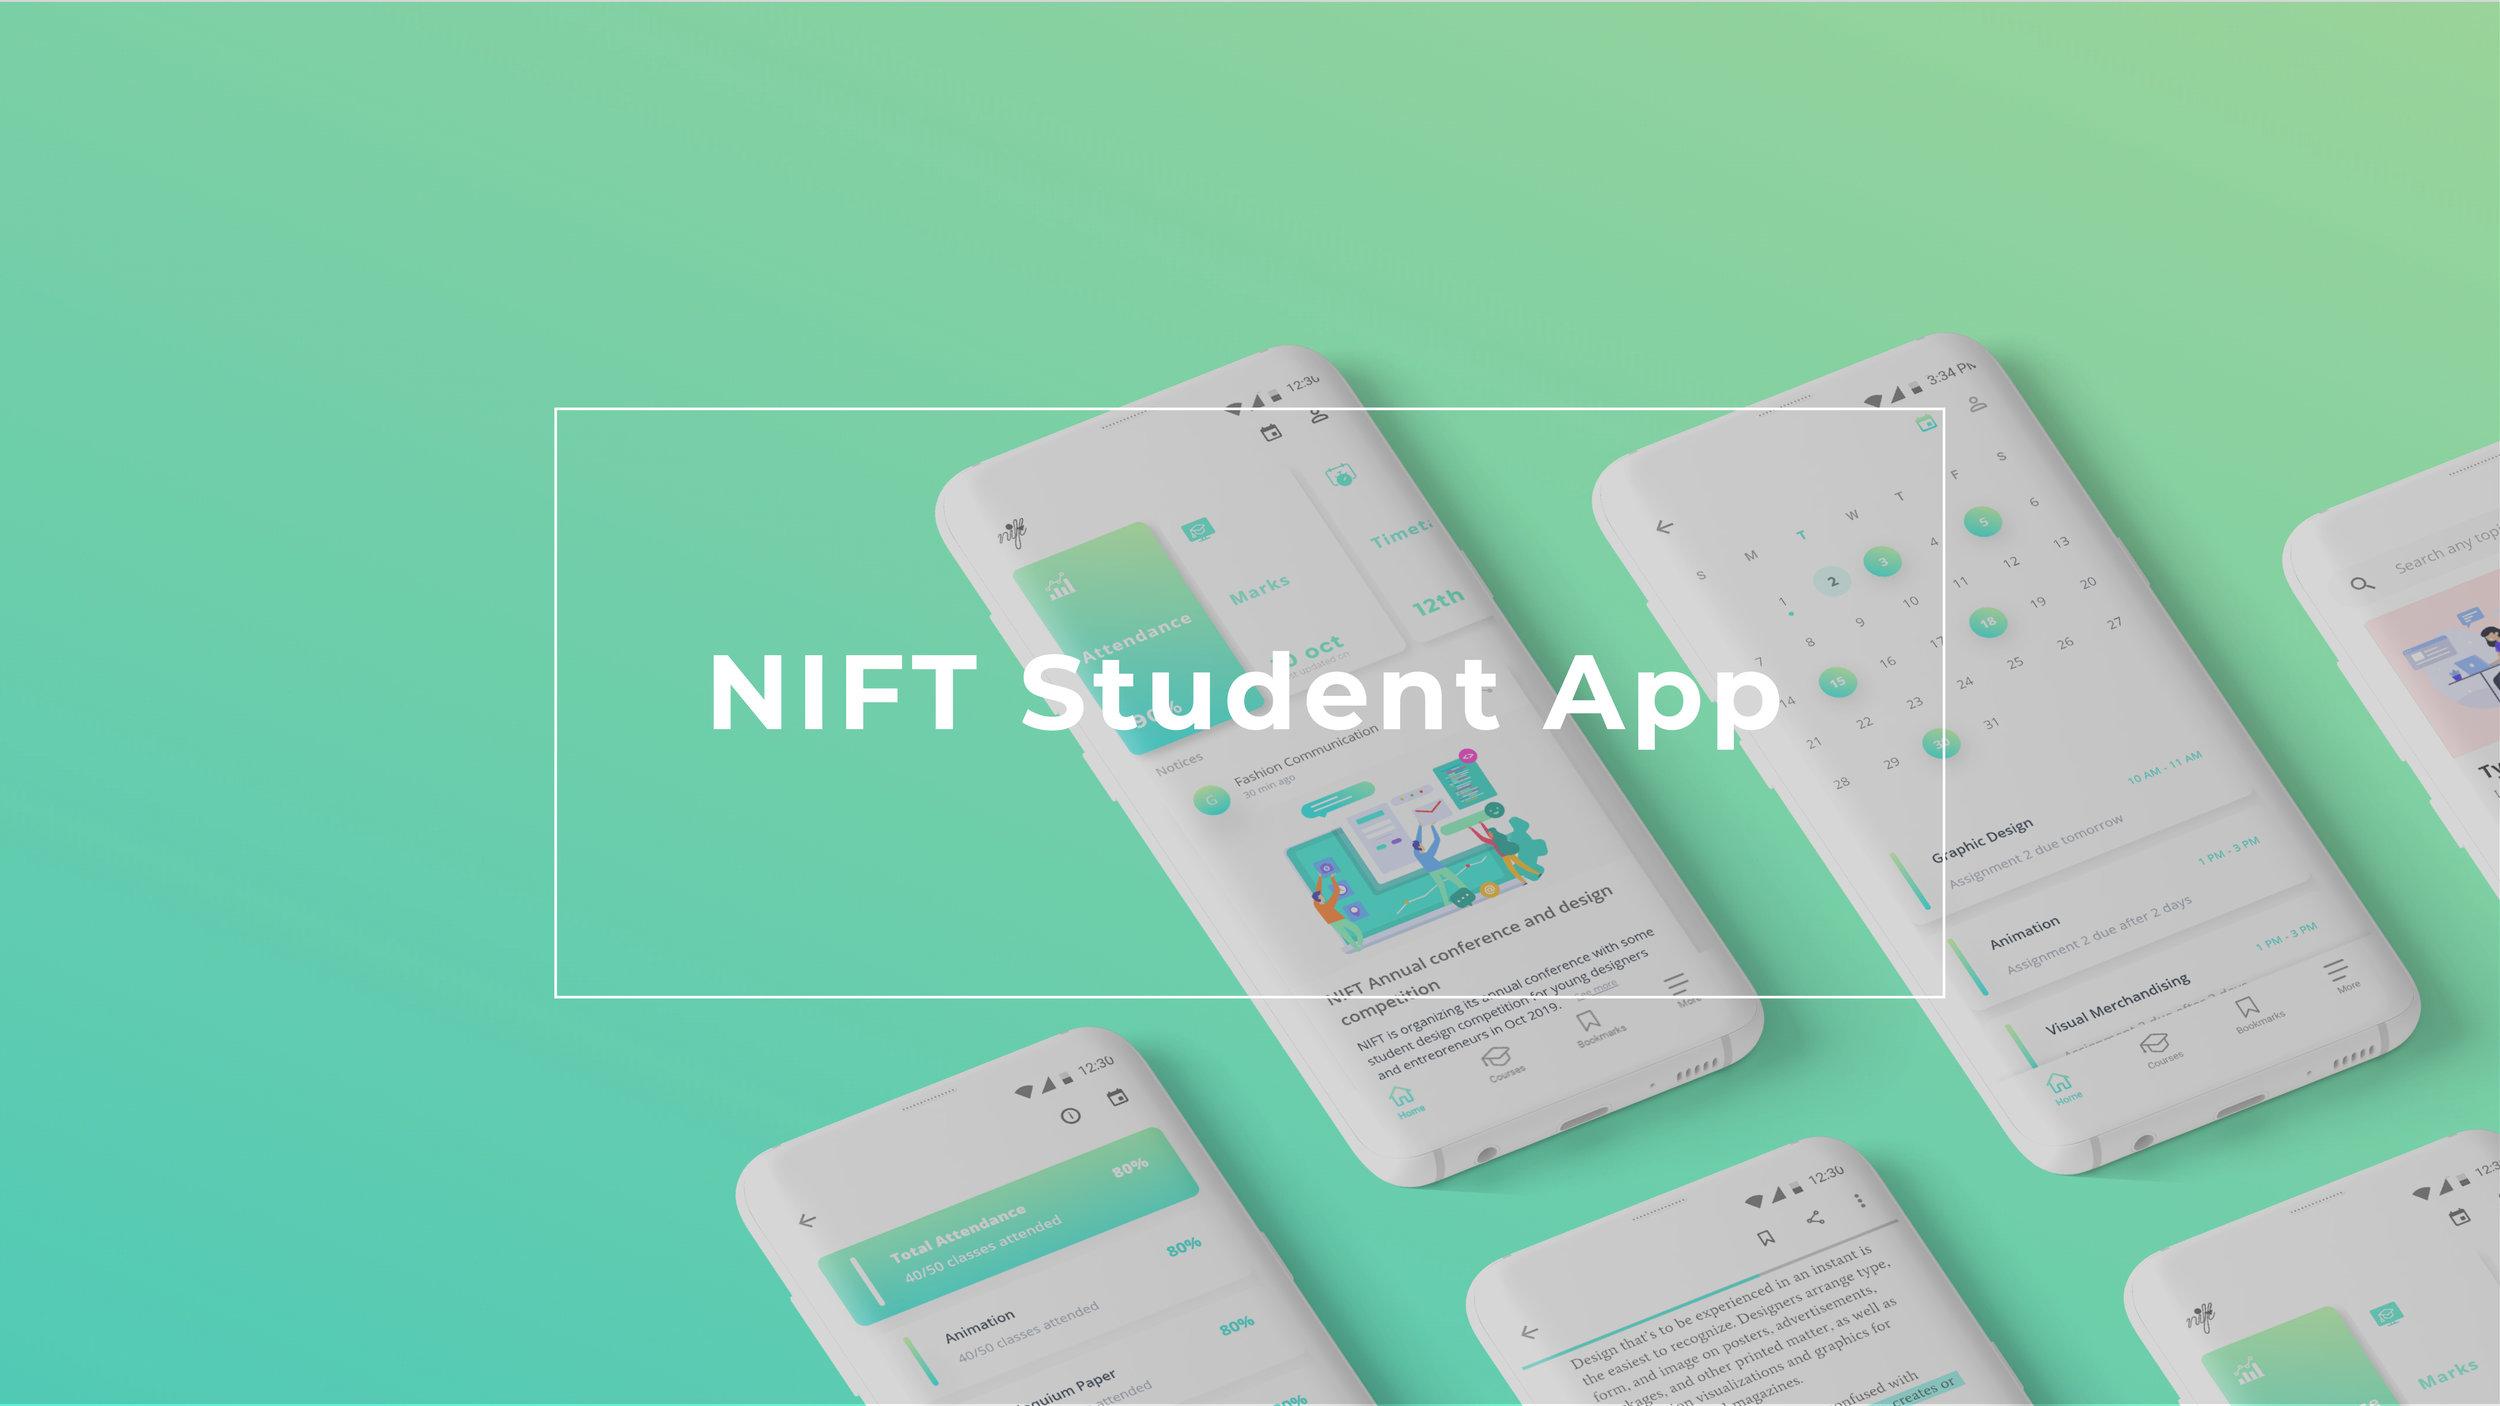 Nift Student App Ira Kaushik